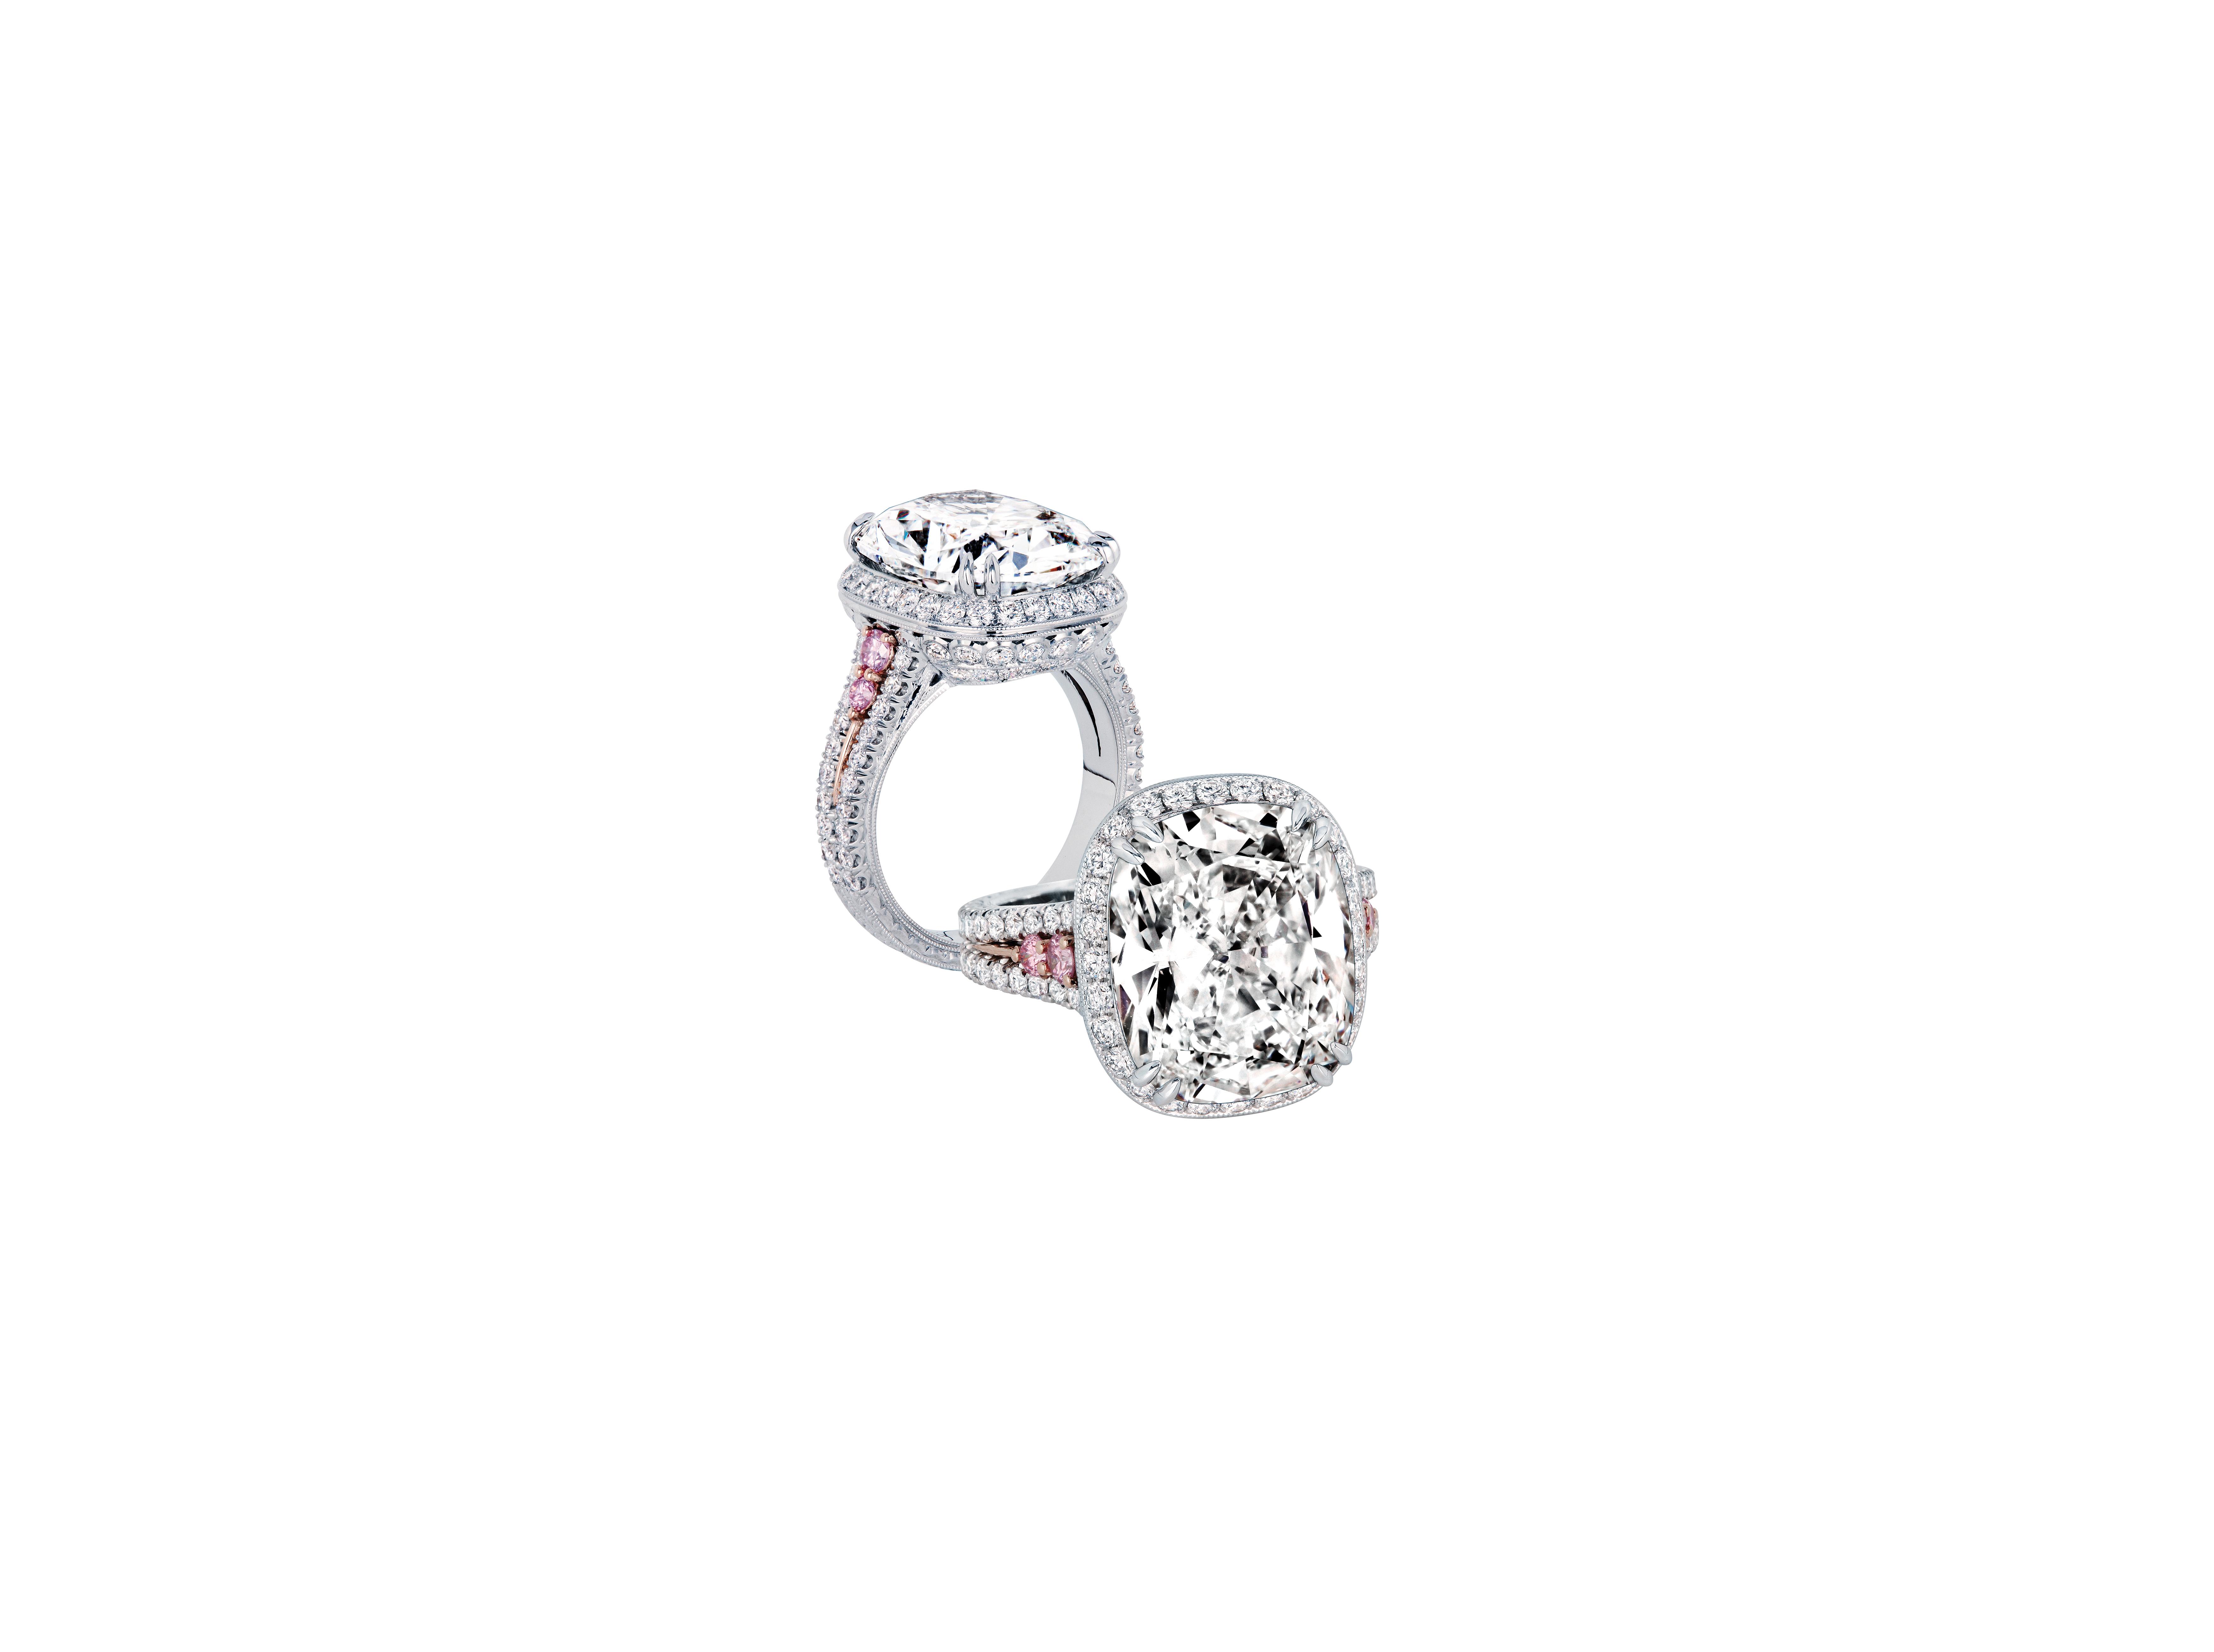 jack kelege cushion cut engagement ring pink diamonds in shank